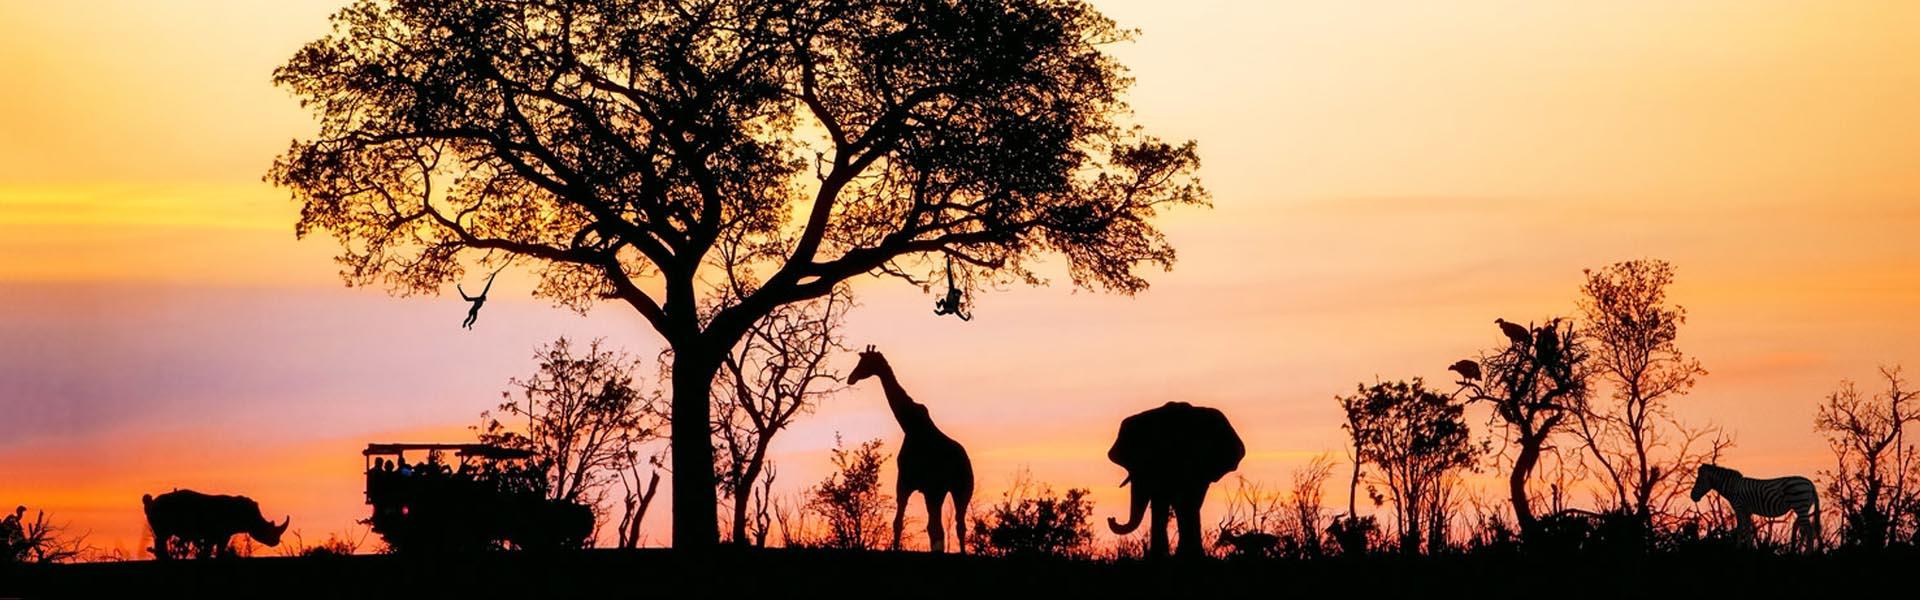 Safari in het Kruger Park bij zonsondergang